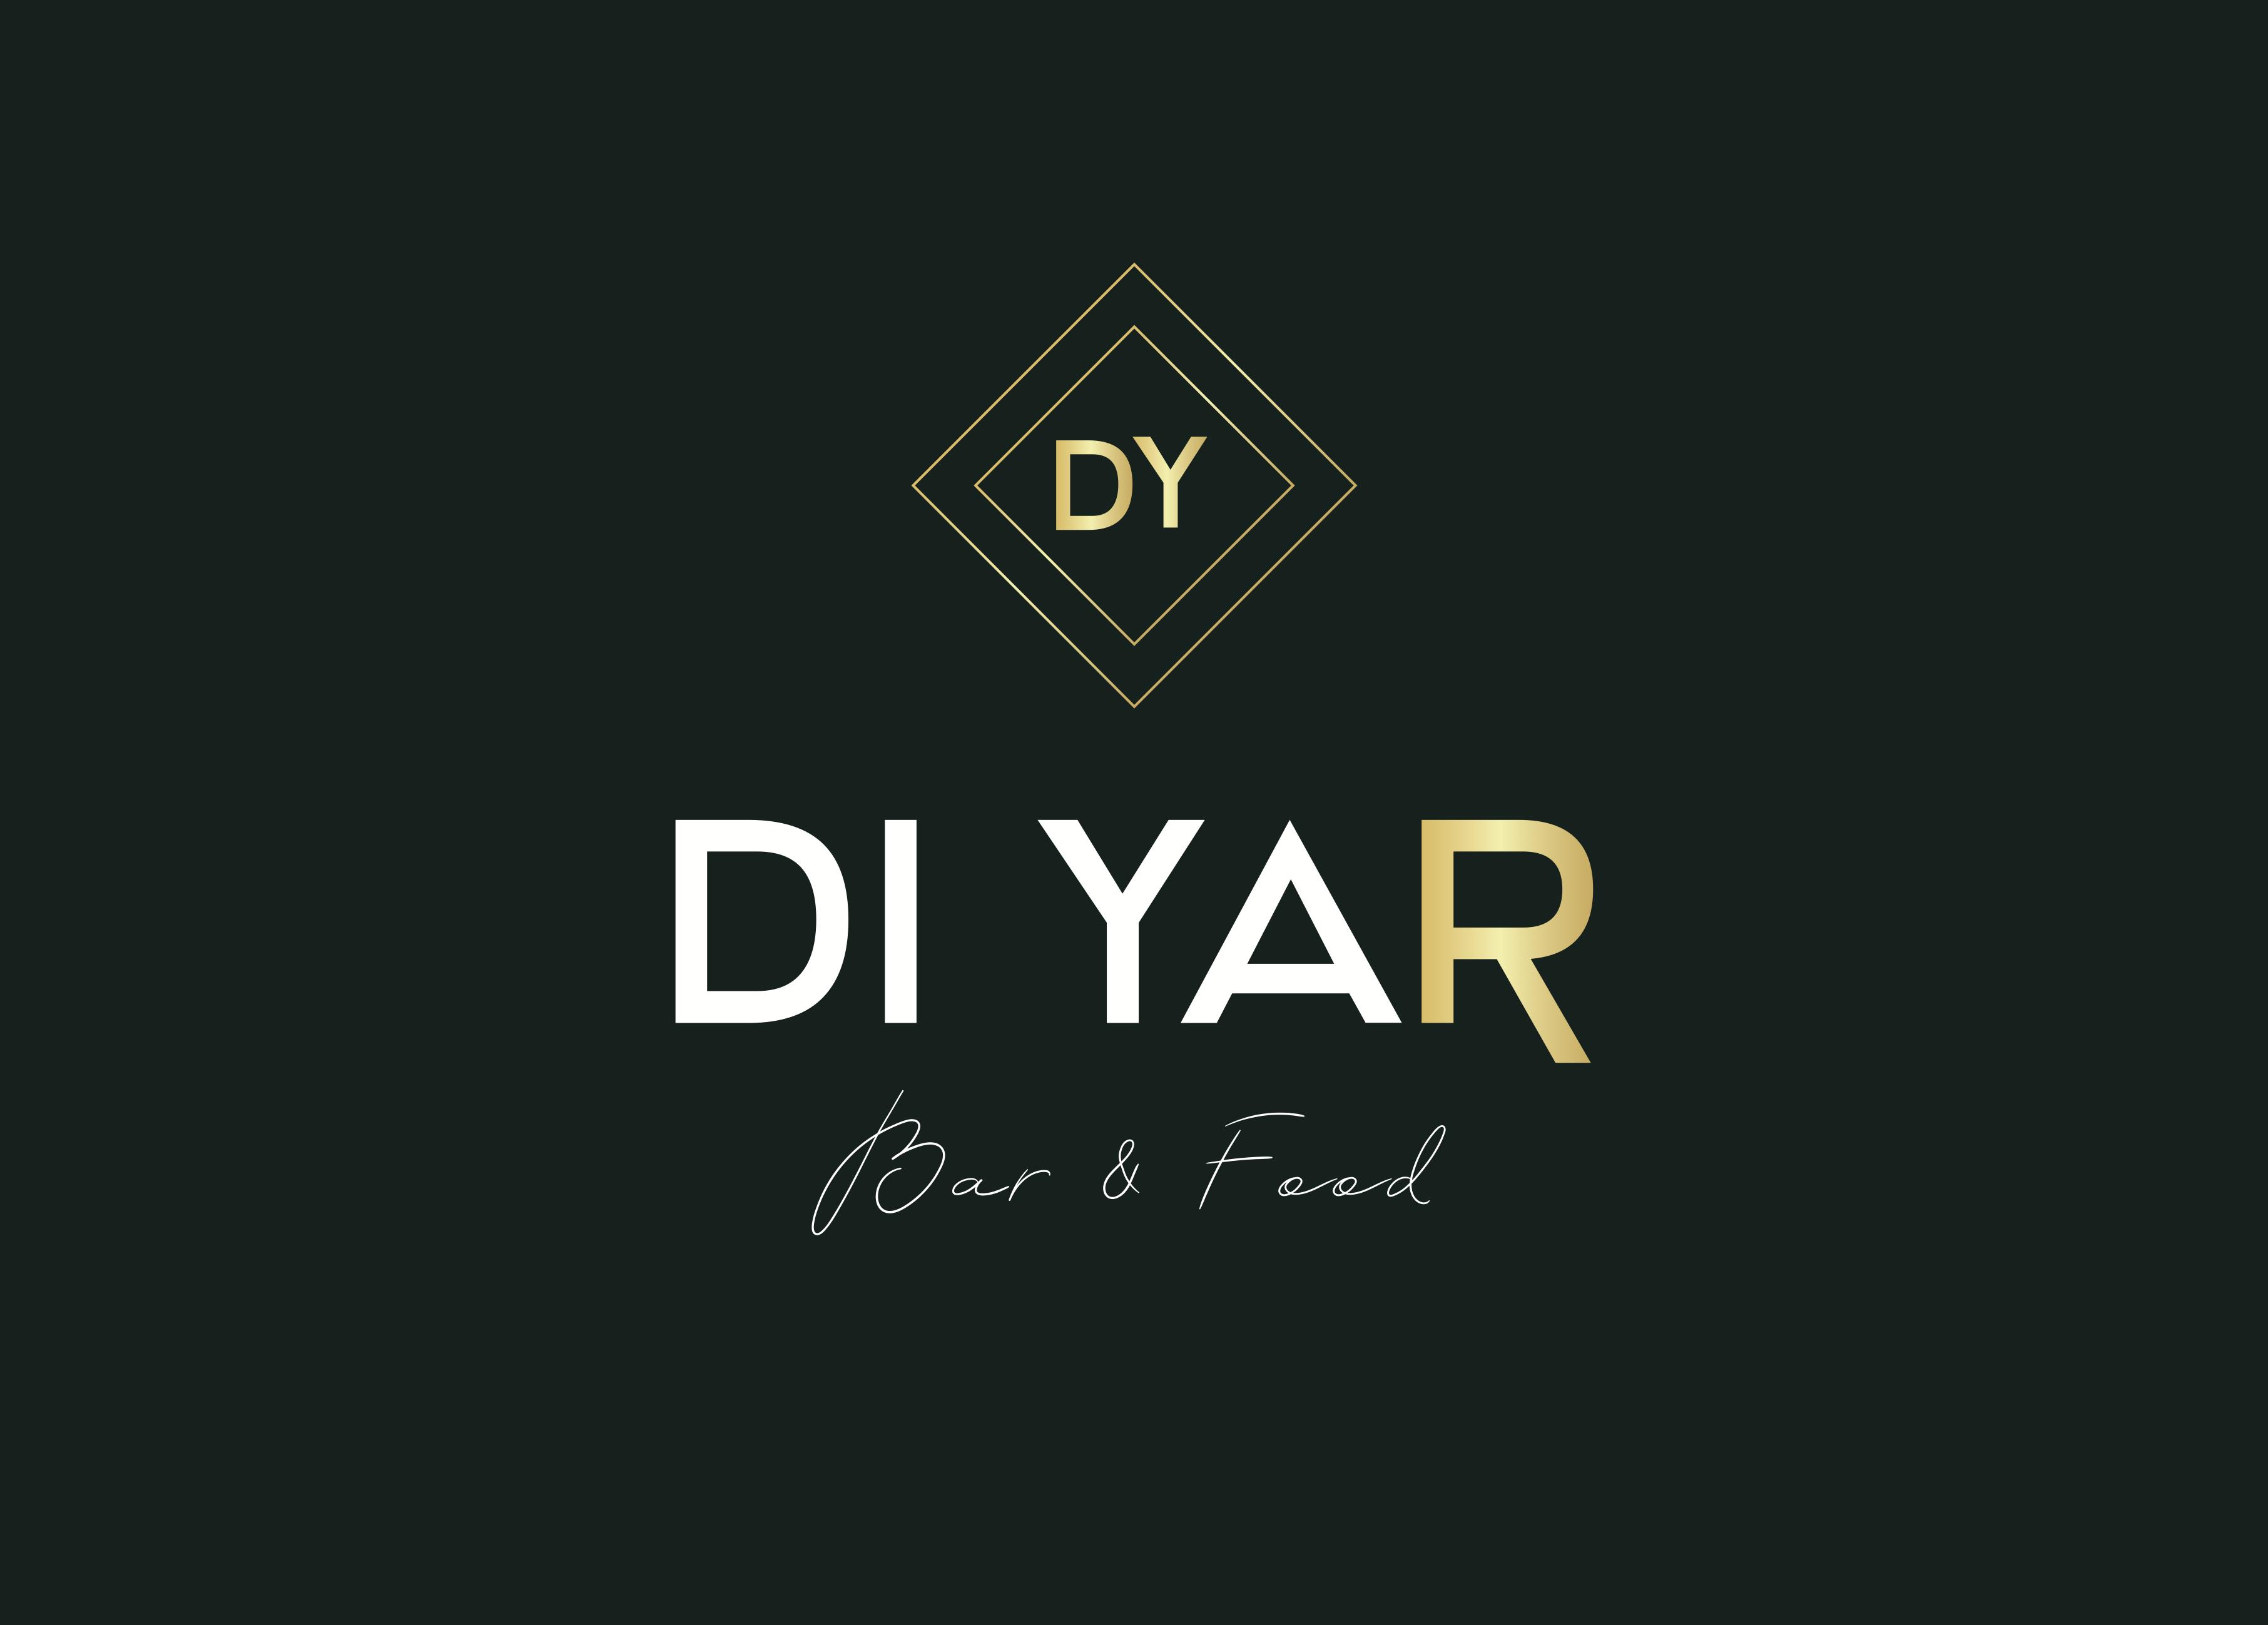 diyar.v.png